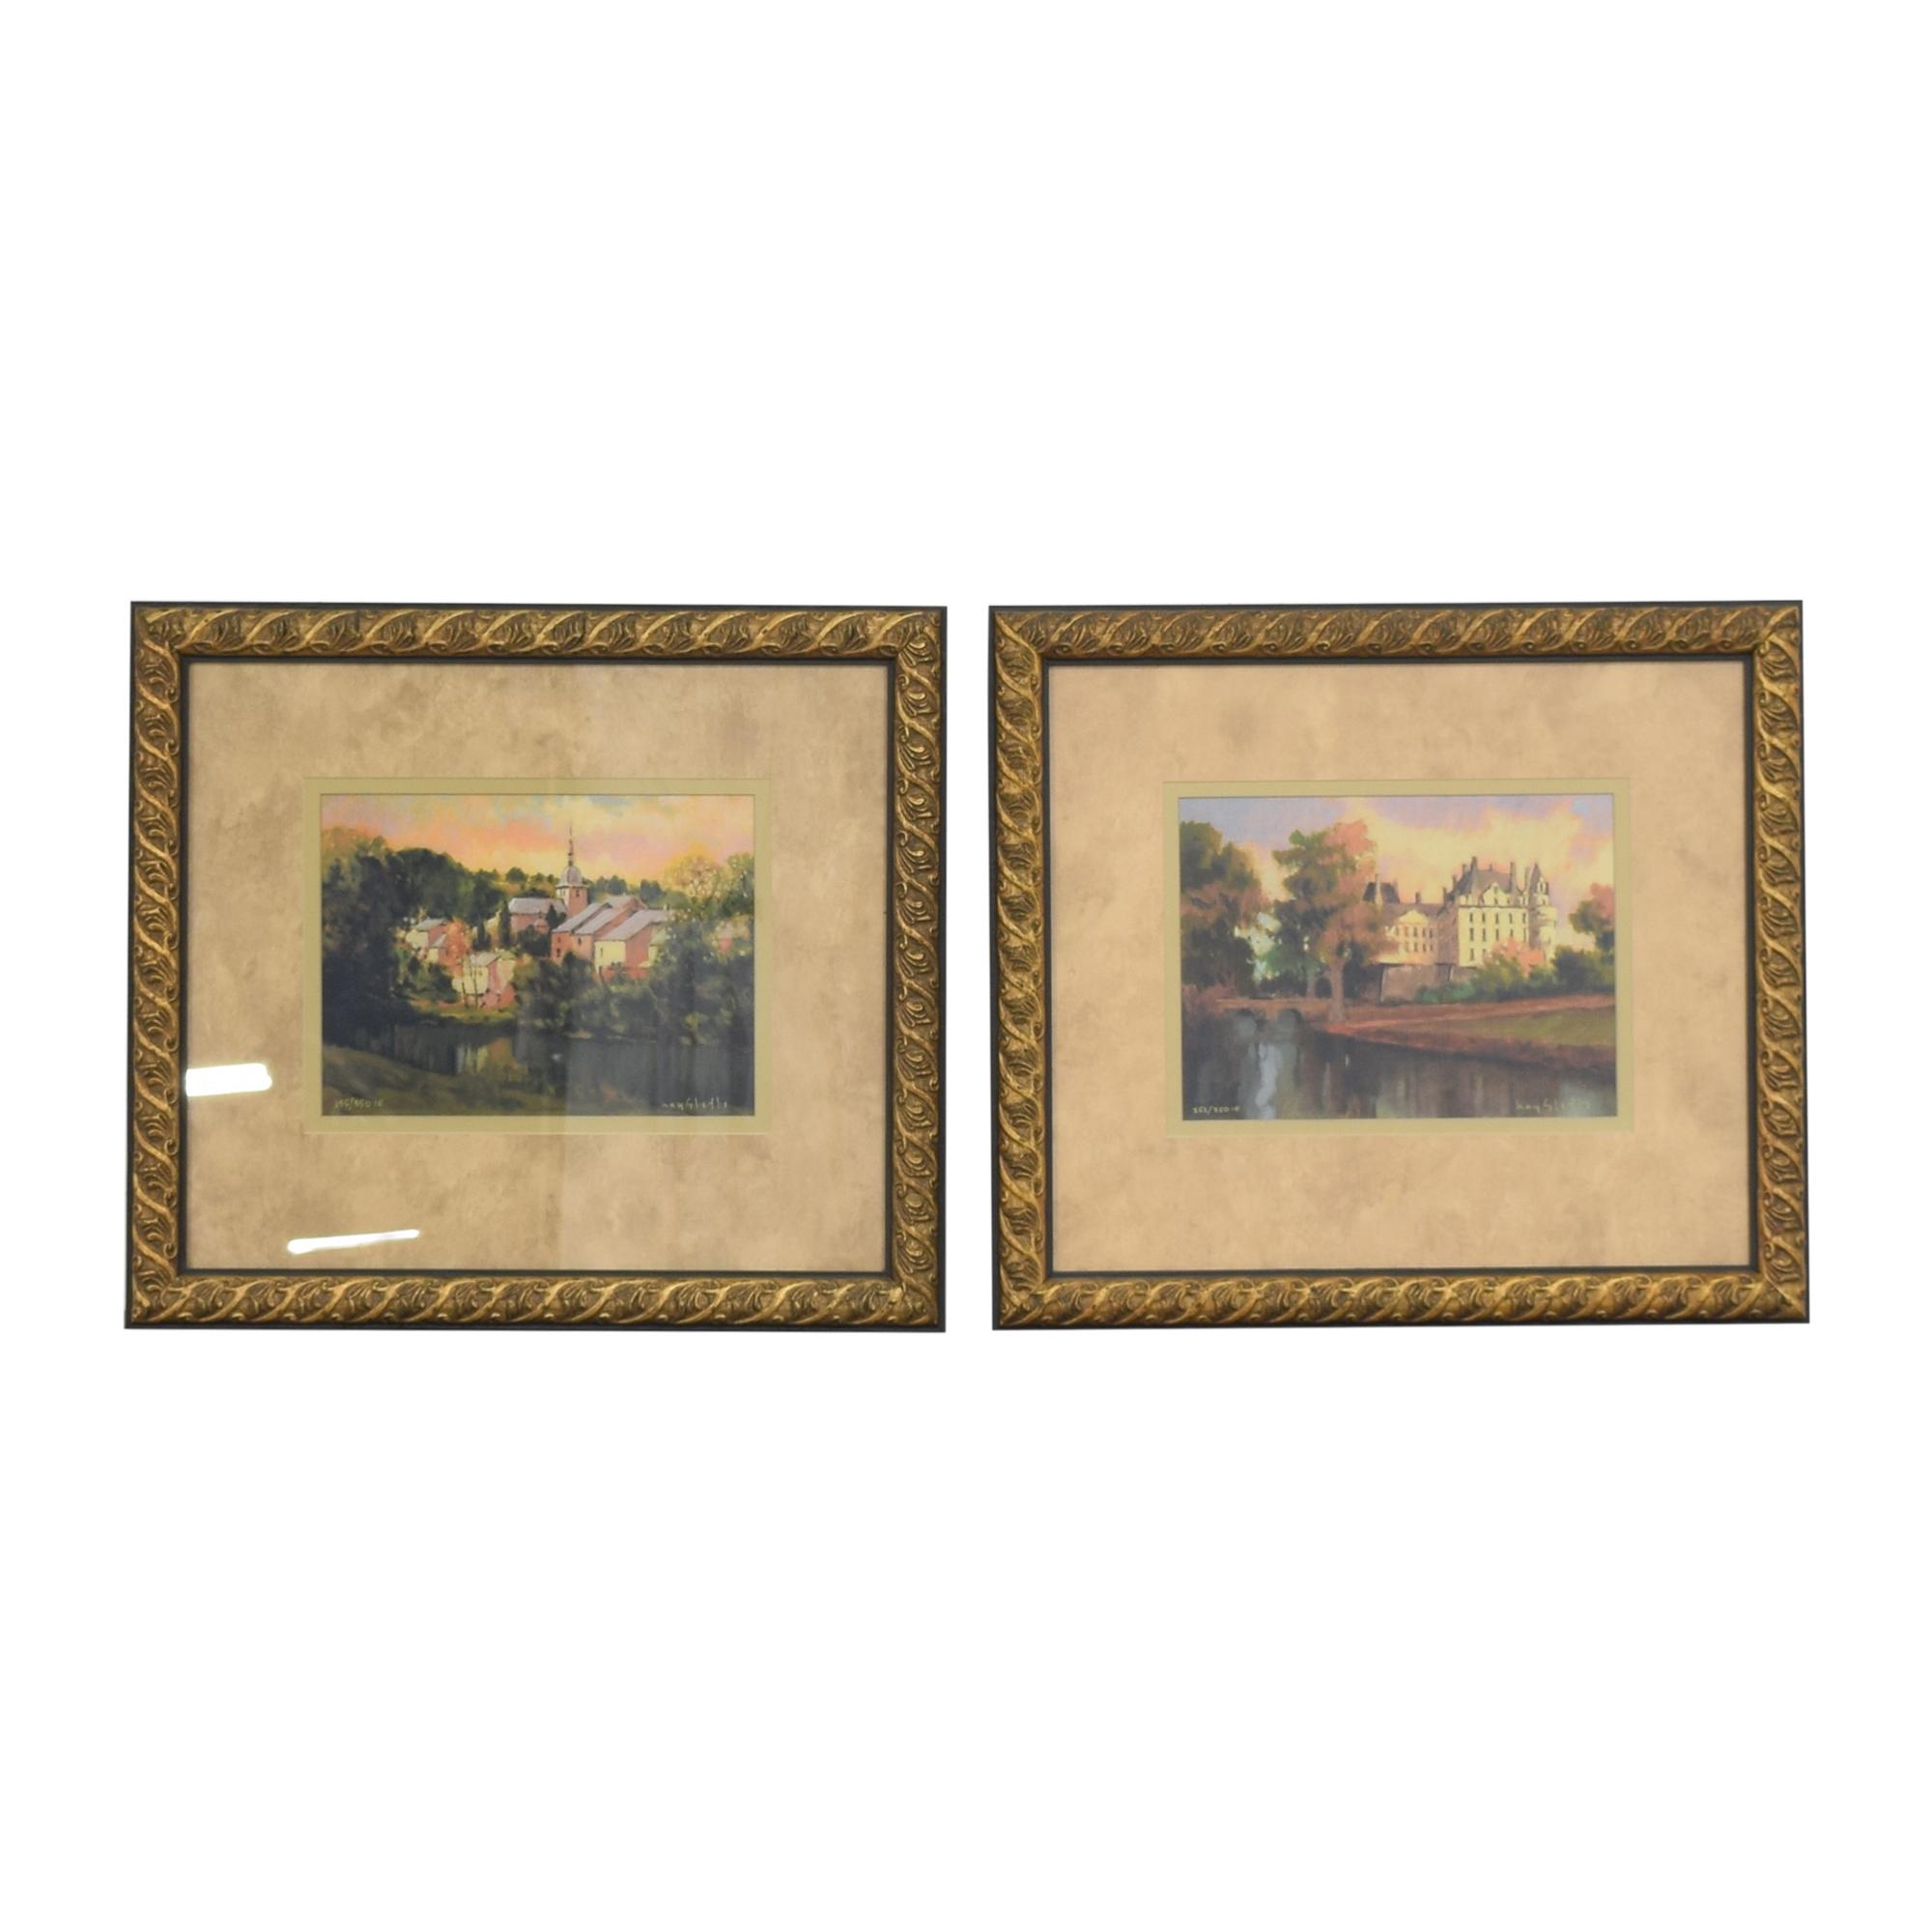 Ethan Allen Ethan Allen Hayslette Framed Prints Wall Art coupon